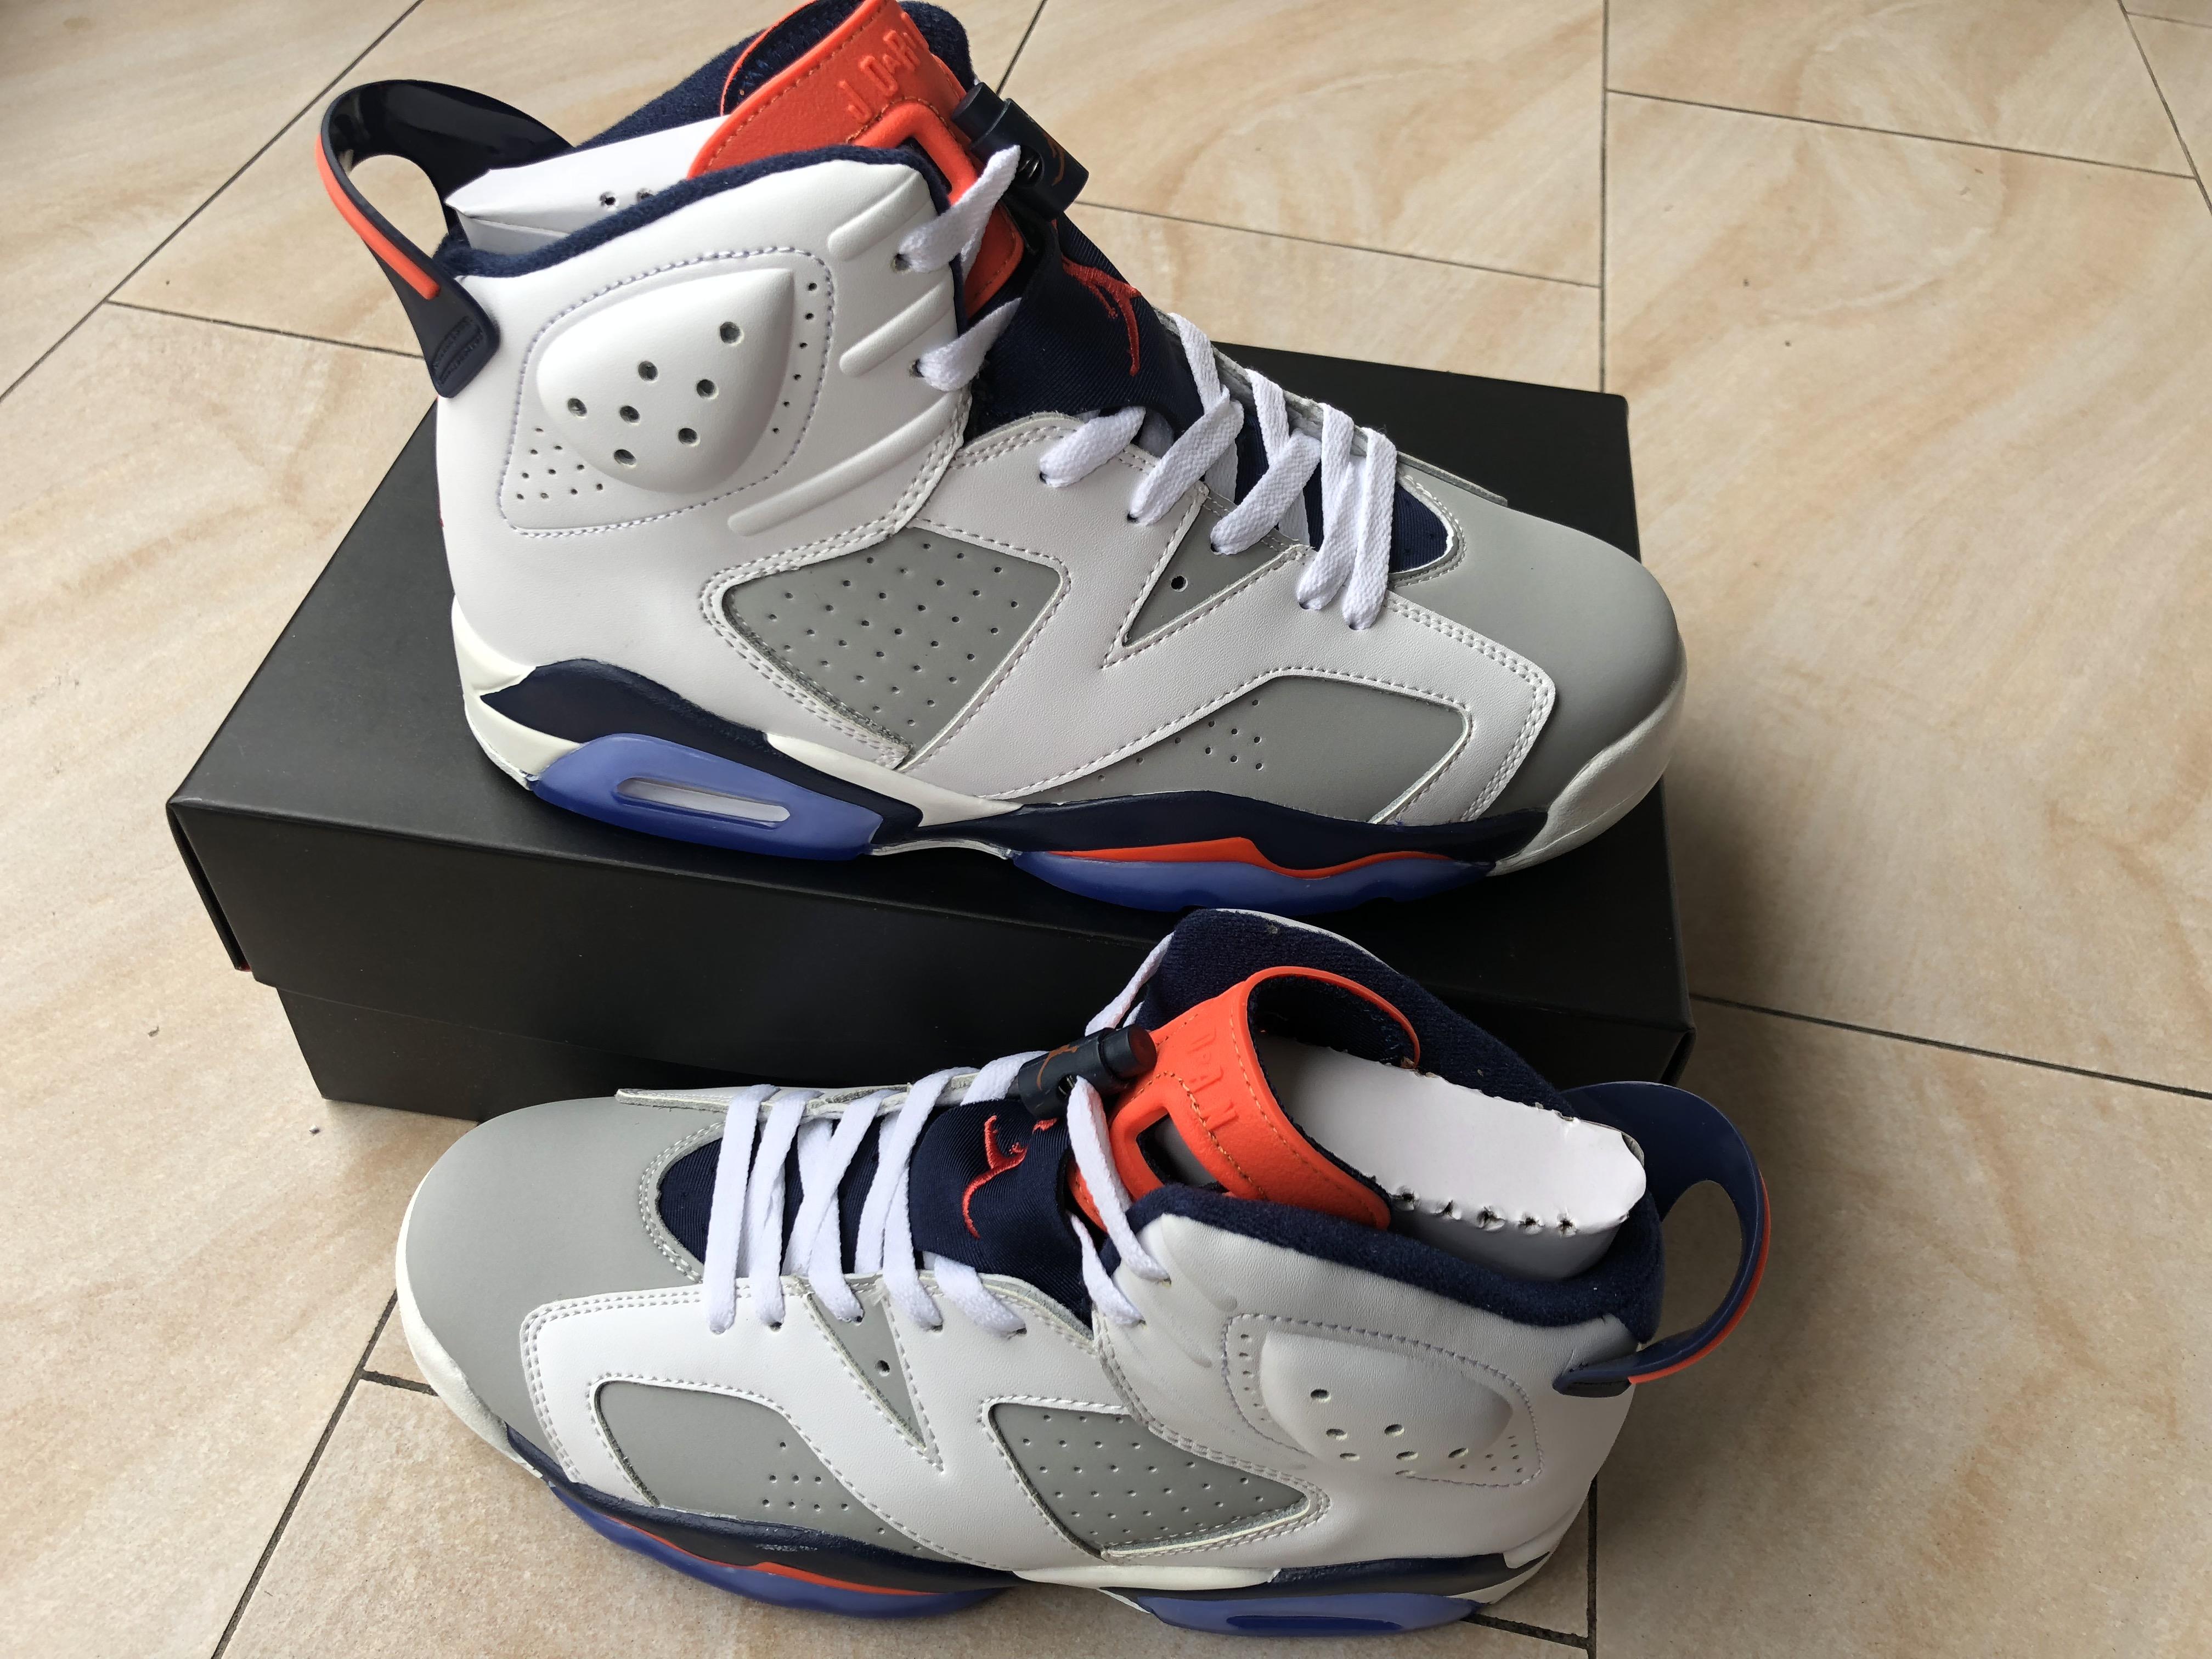 info for 7a700 42475 Women Air Jordan 6 Retro Handy Grey White Orange Blue Shoes